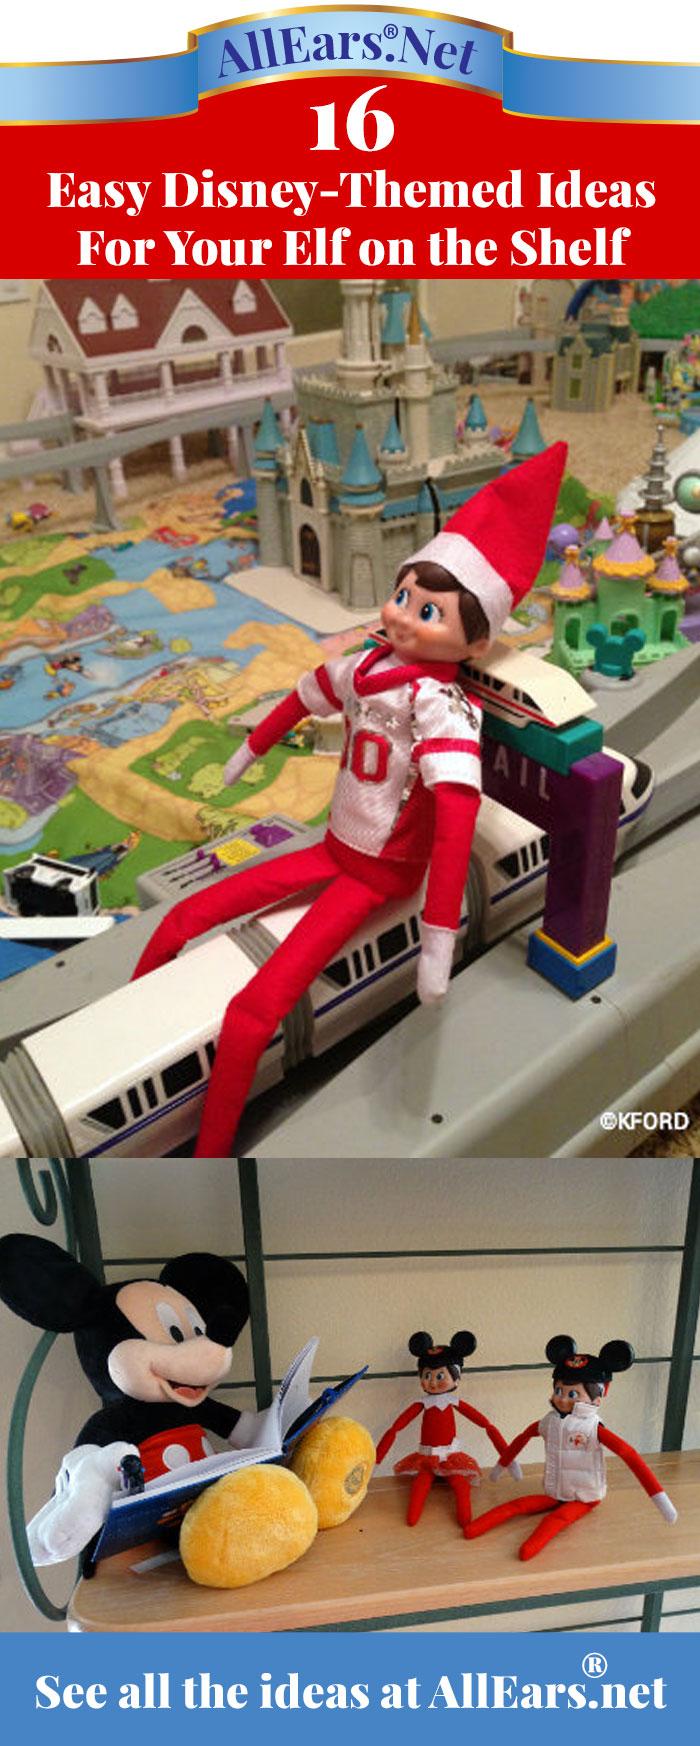 16 easy Disney-themed ideas for your Elf on a Shelf | AllEars.net